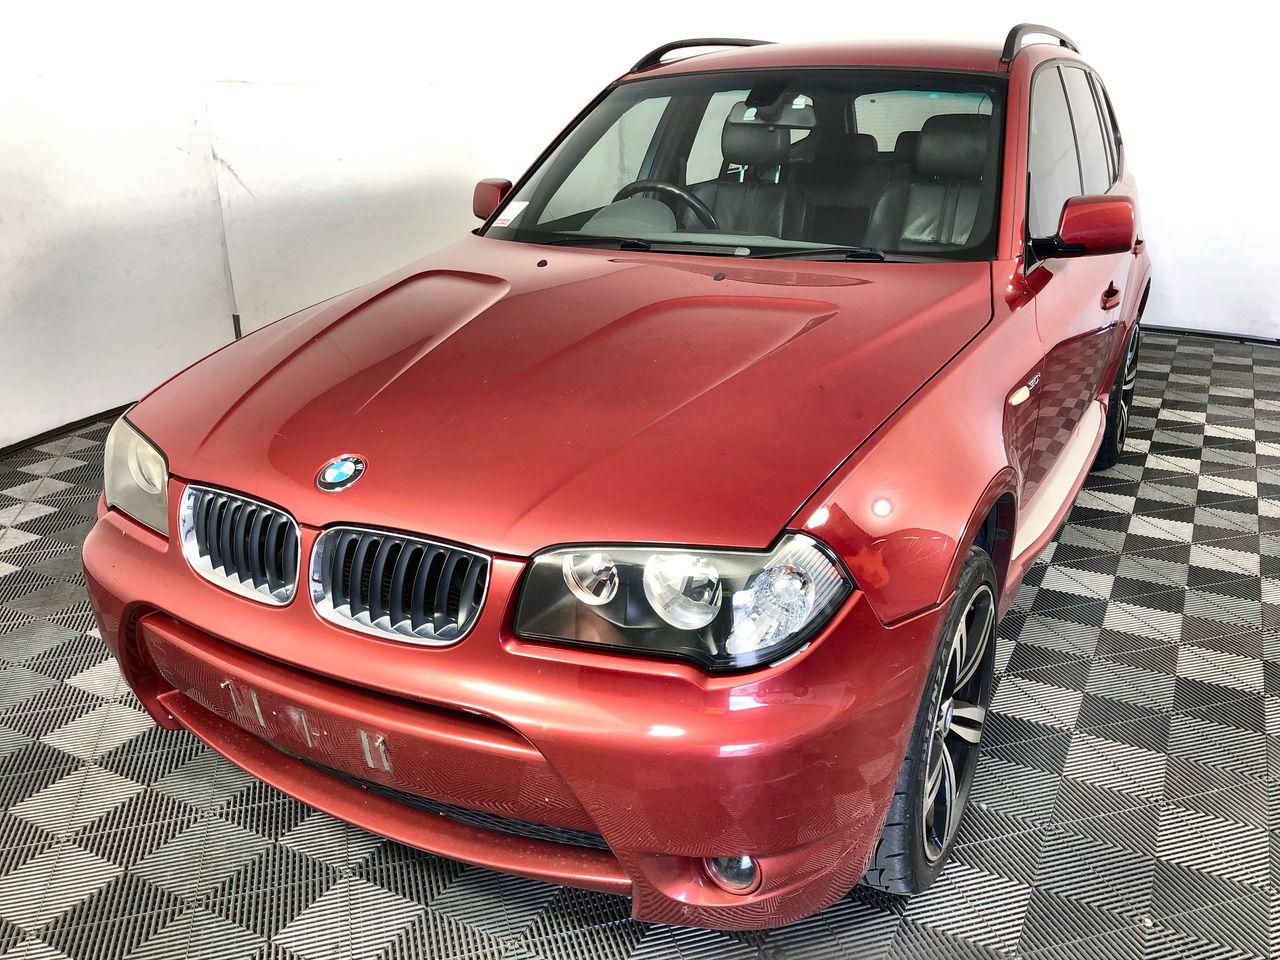 2004 (2005) BMW X3 E83 Automatic Wagon